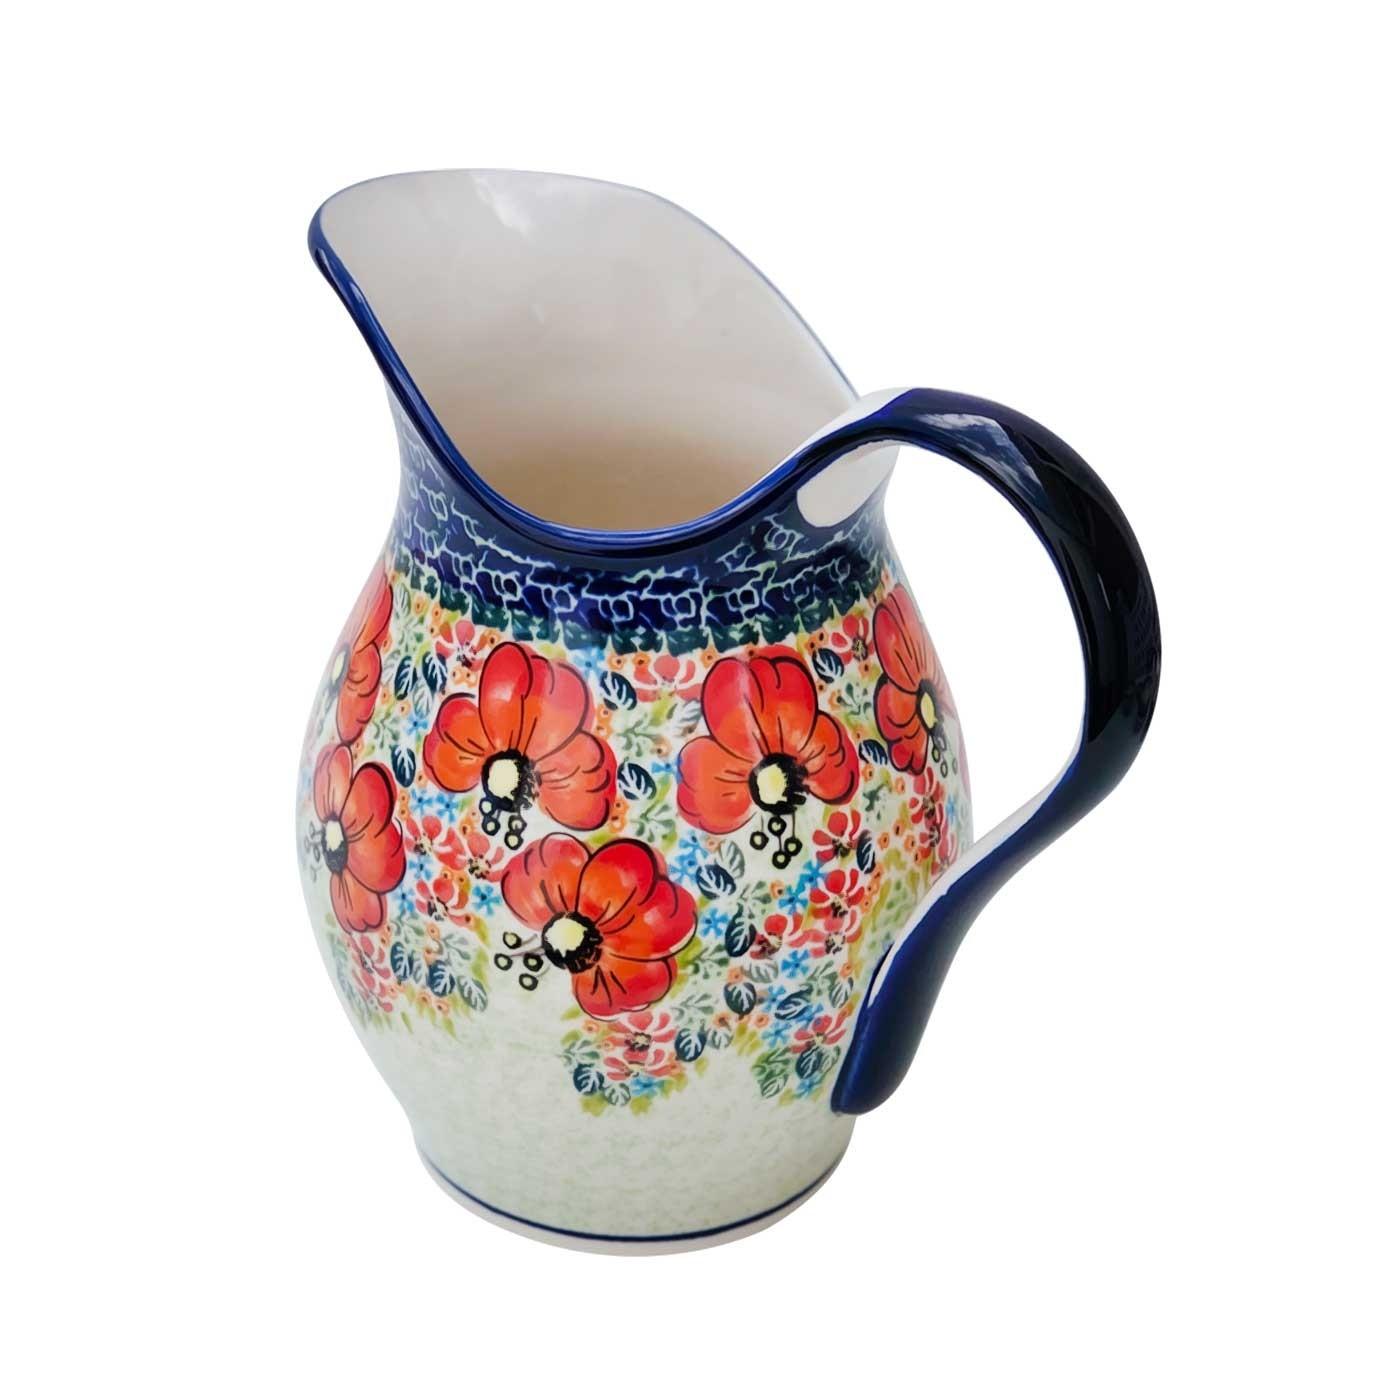 Pottery Avenue 2-Quart Stoneware Pitcher -1160-296AR